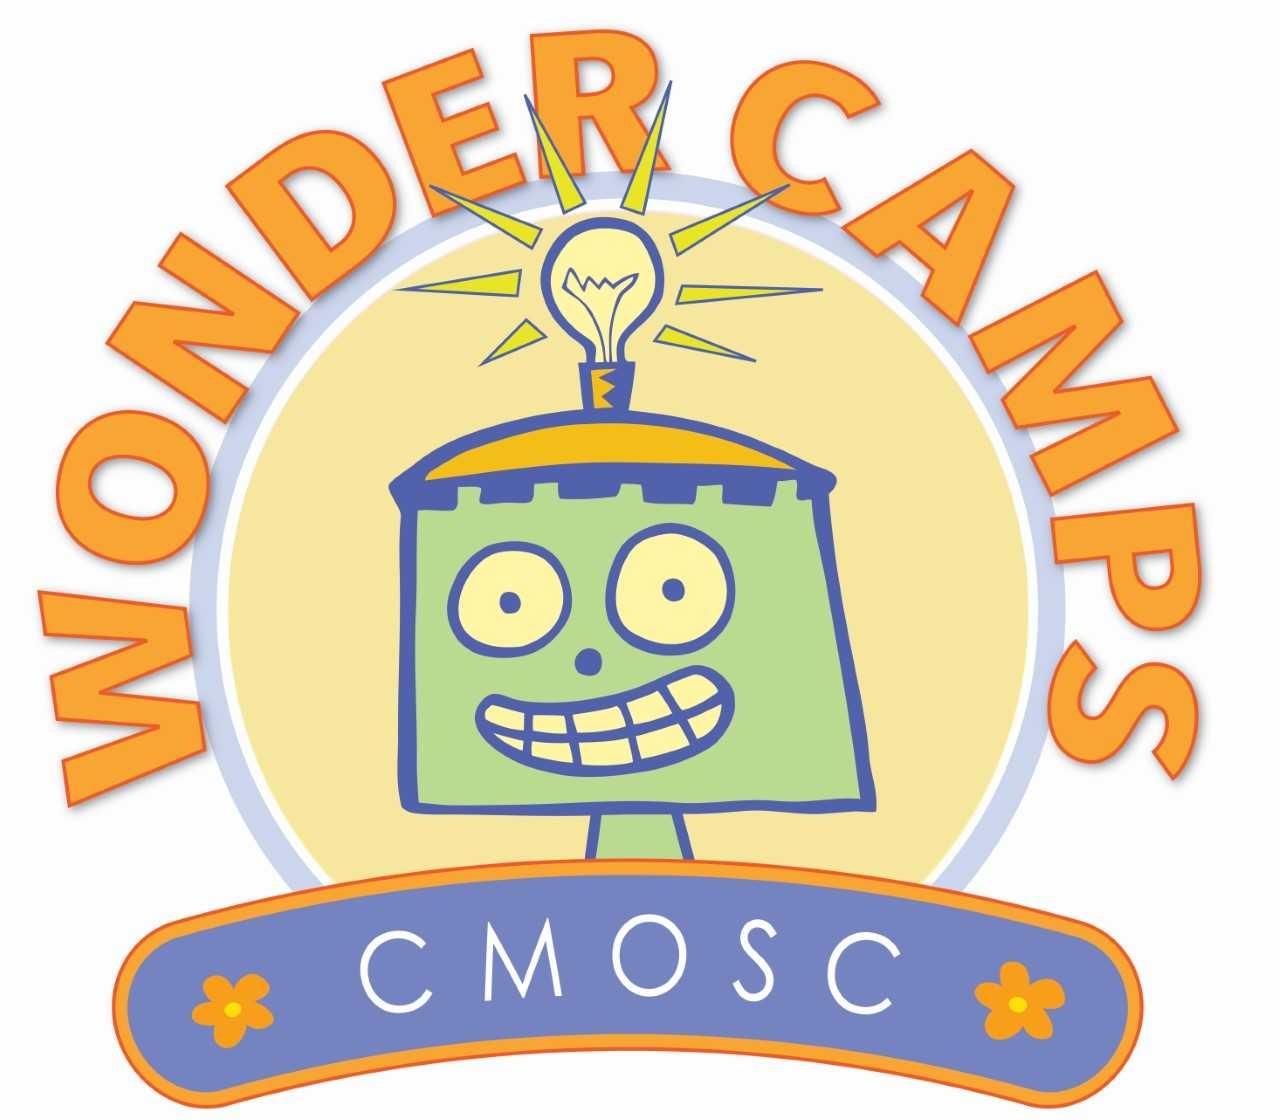 Wonder Camps CMOSC logo